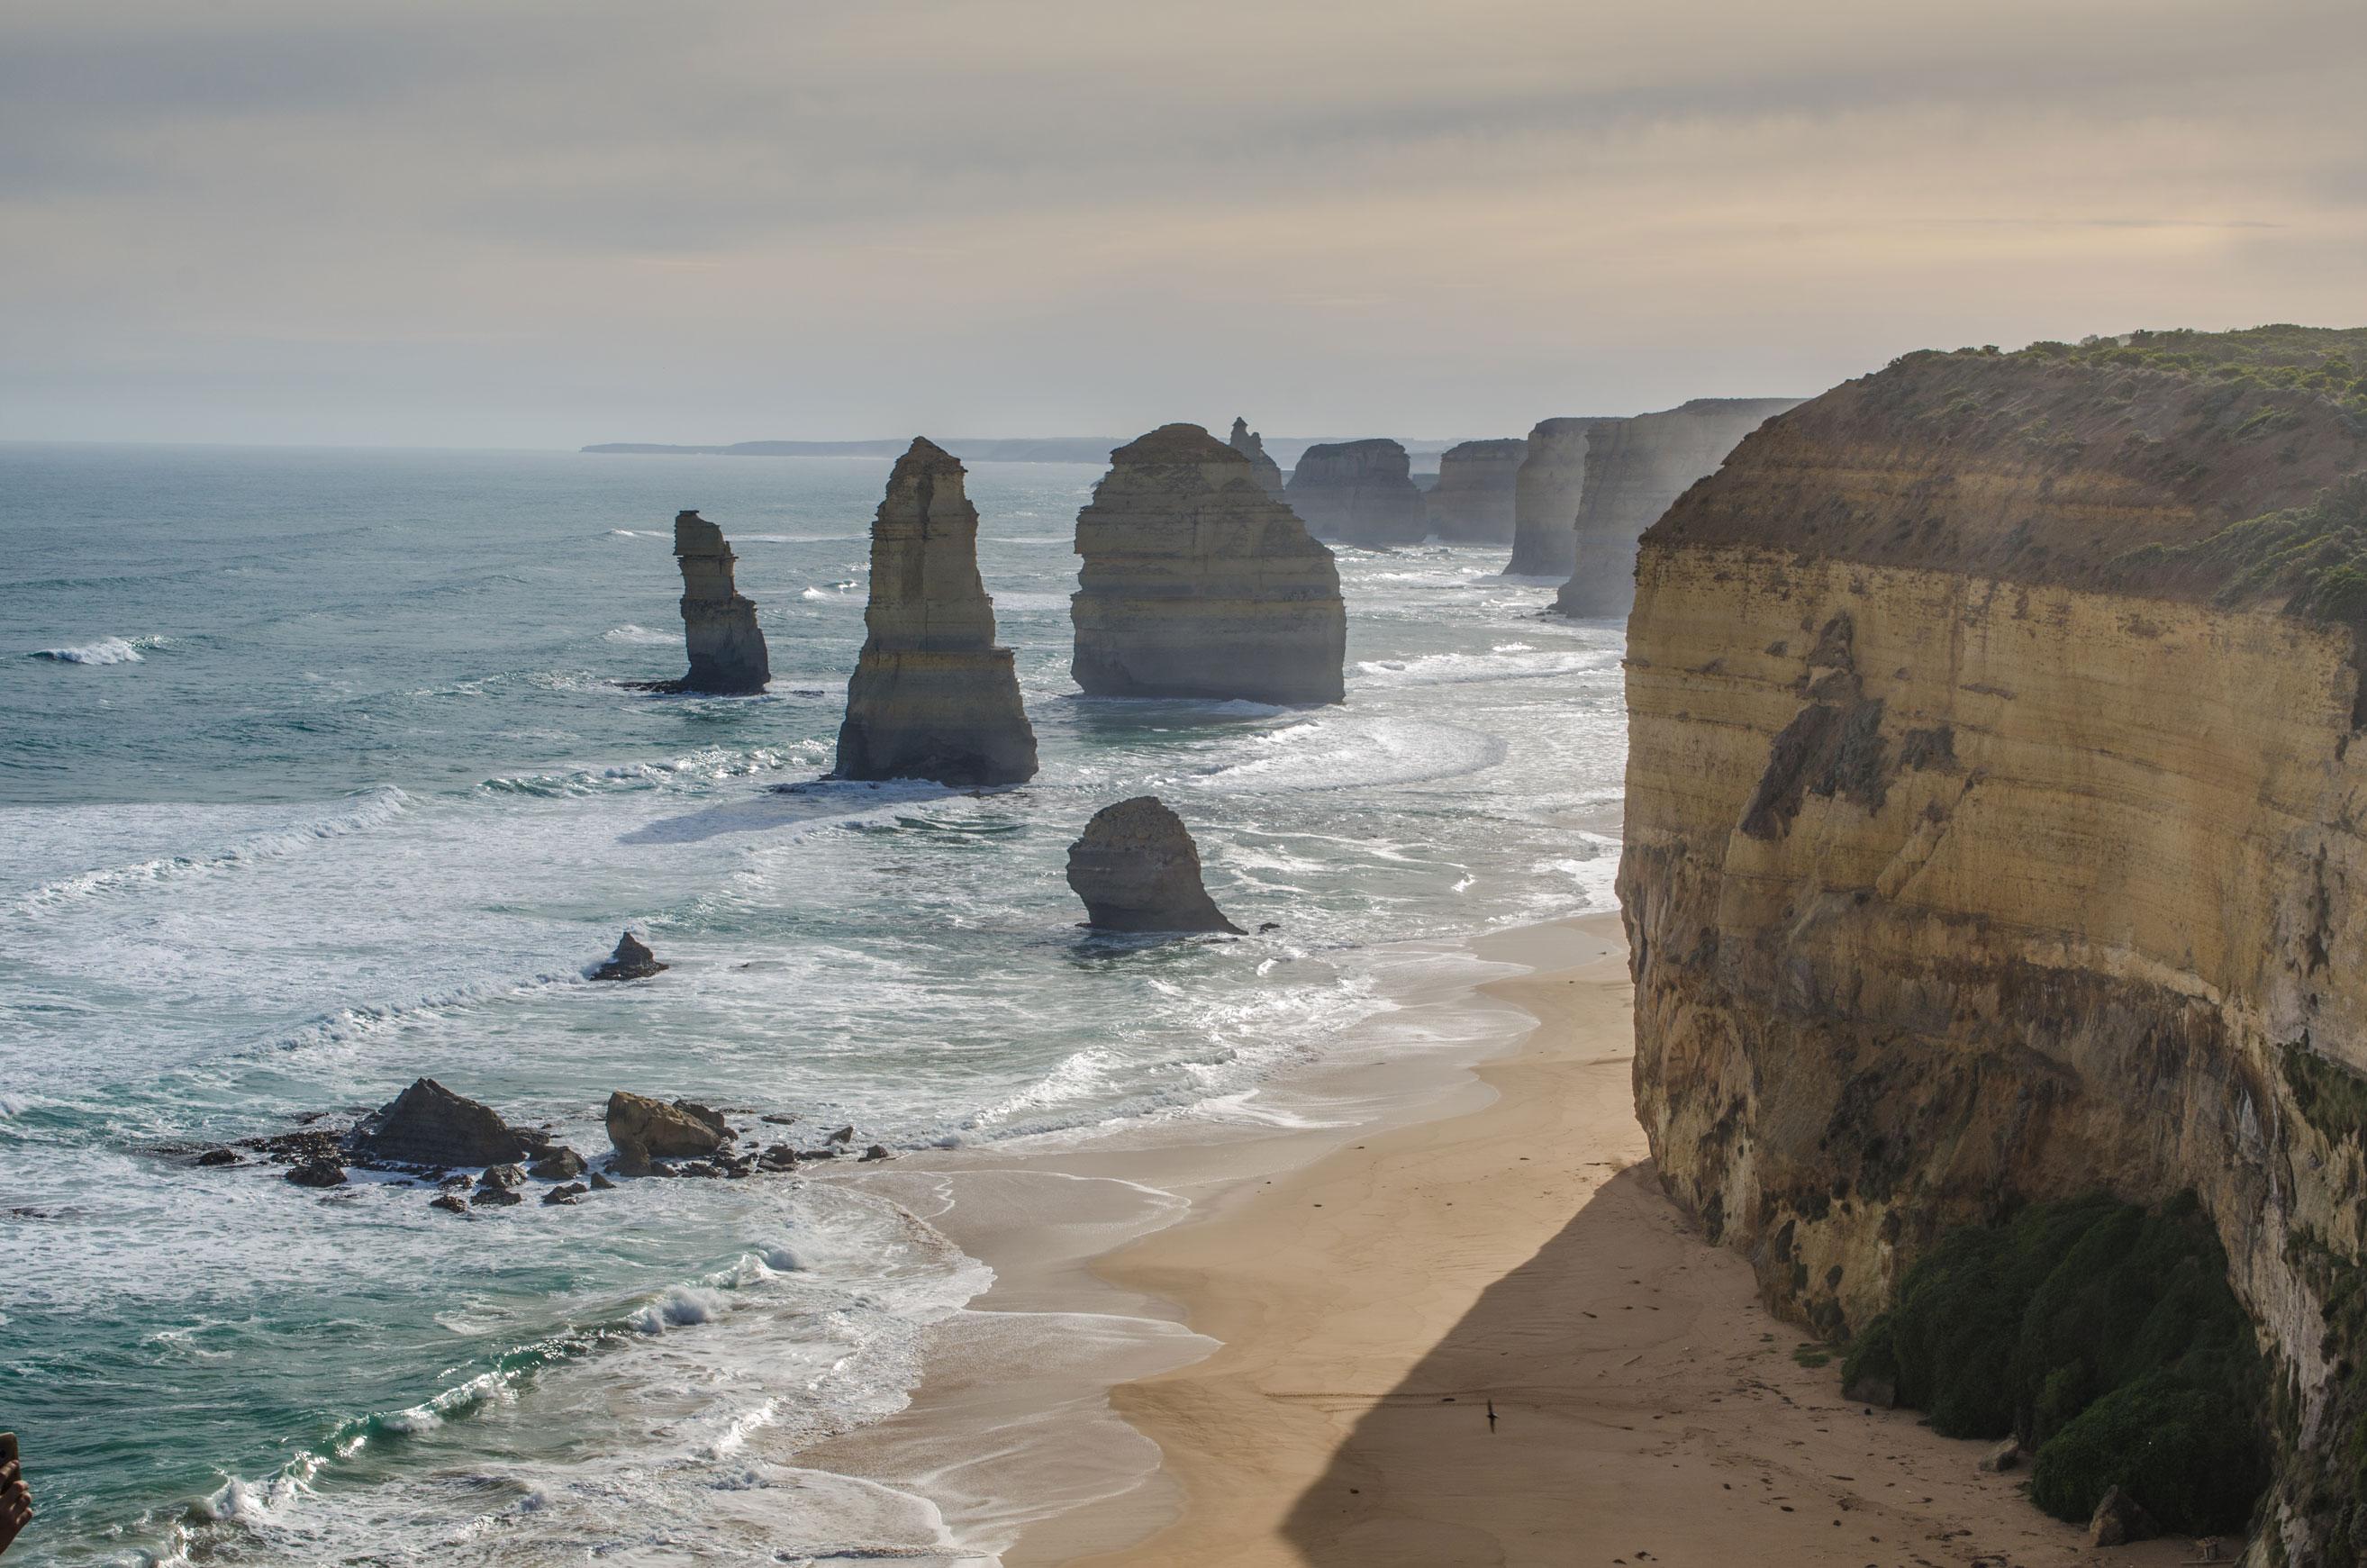 Paesaggi-Australia - DSC 6075 - 12-Apostoli-12-Apostoles-Australia - 12-Apostoli-12-Apostoles-Australia